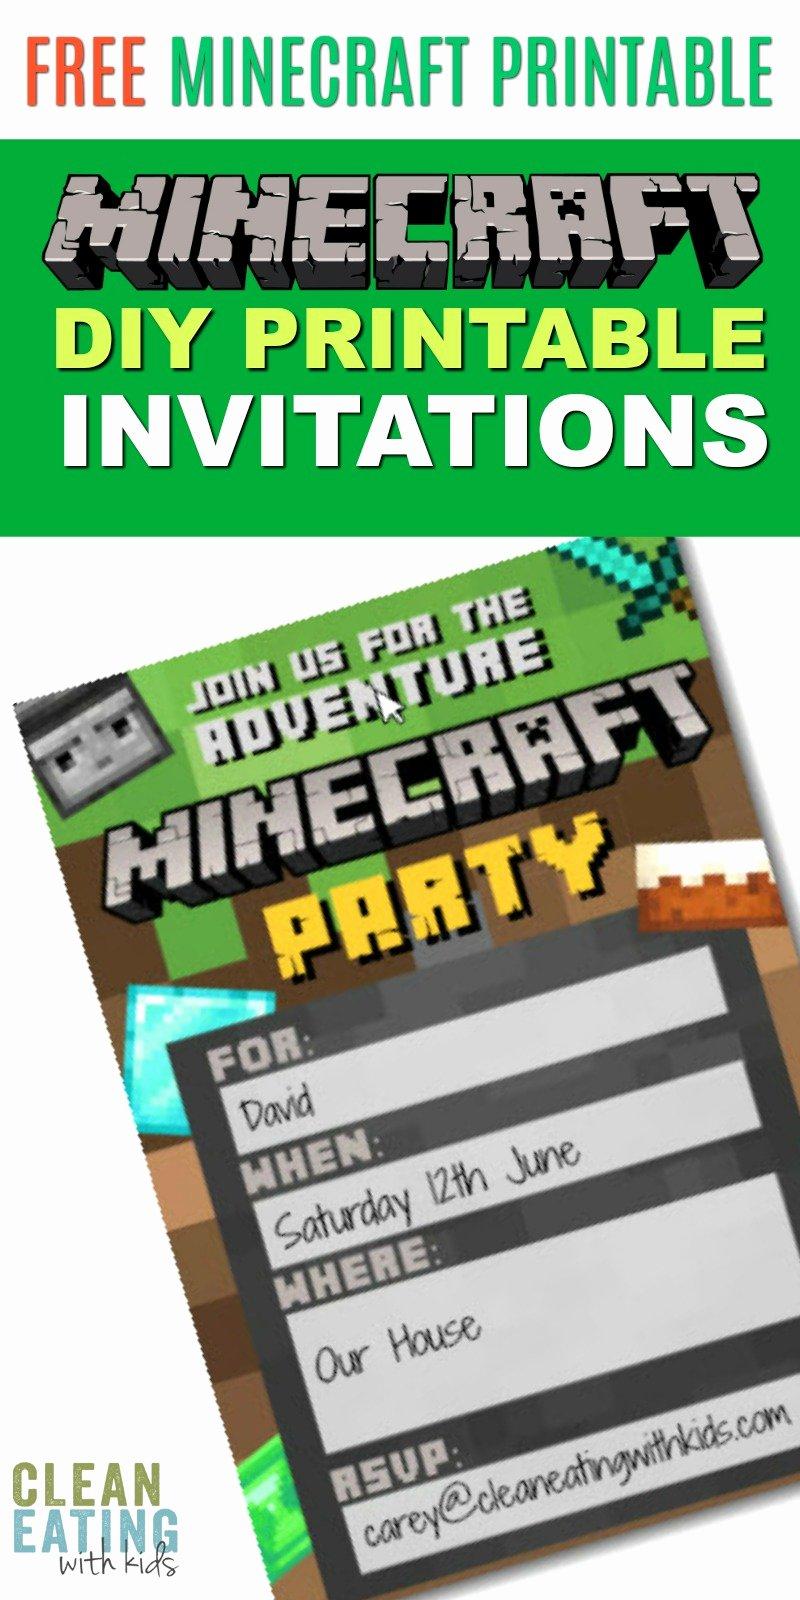 Minecraft Birthday Invite Templates Luxury Free Diy Printable Minecraft Birthday Invitation Clean